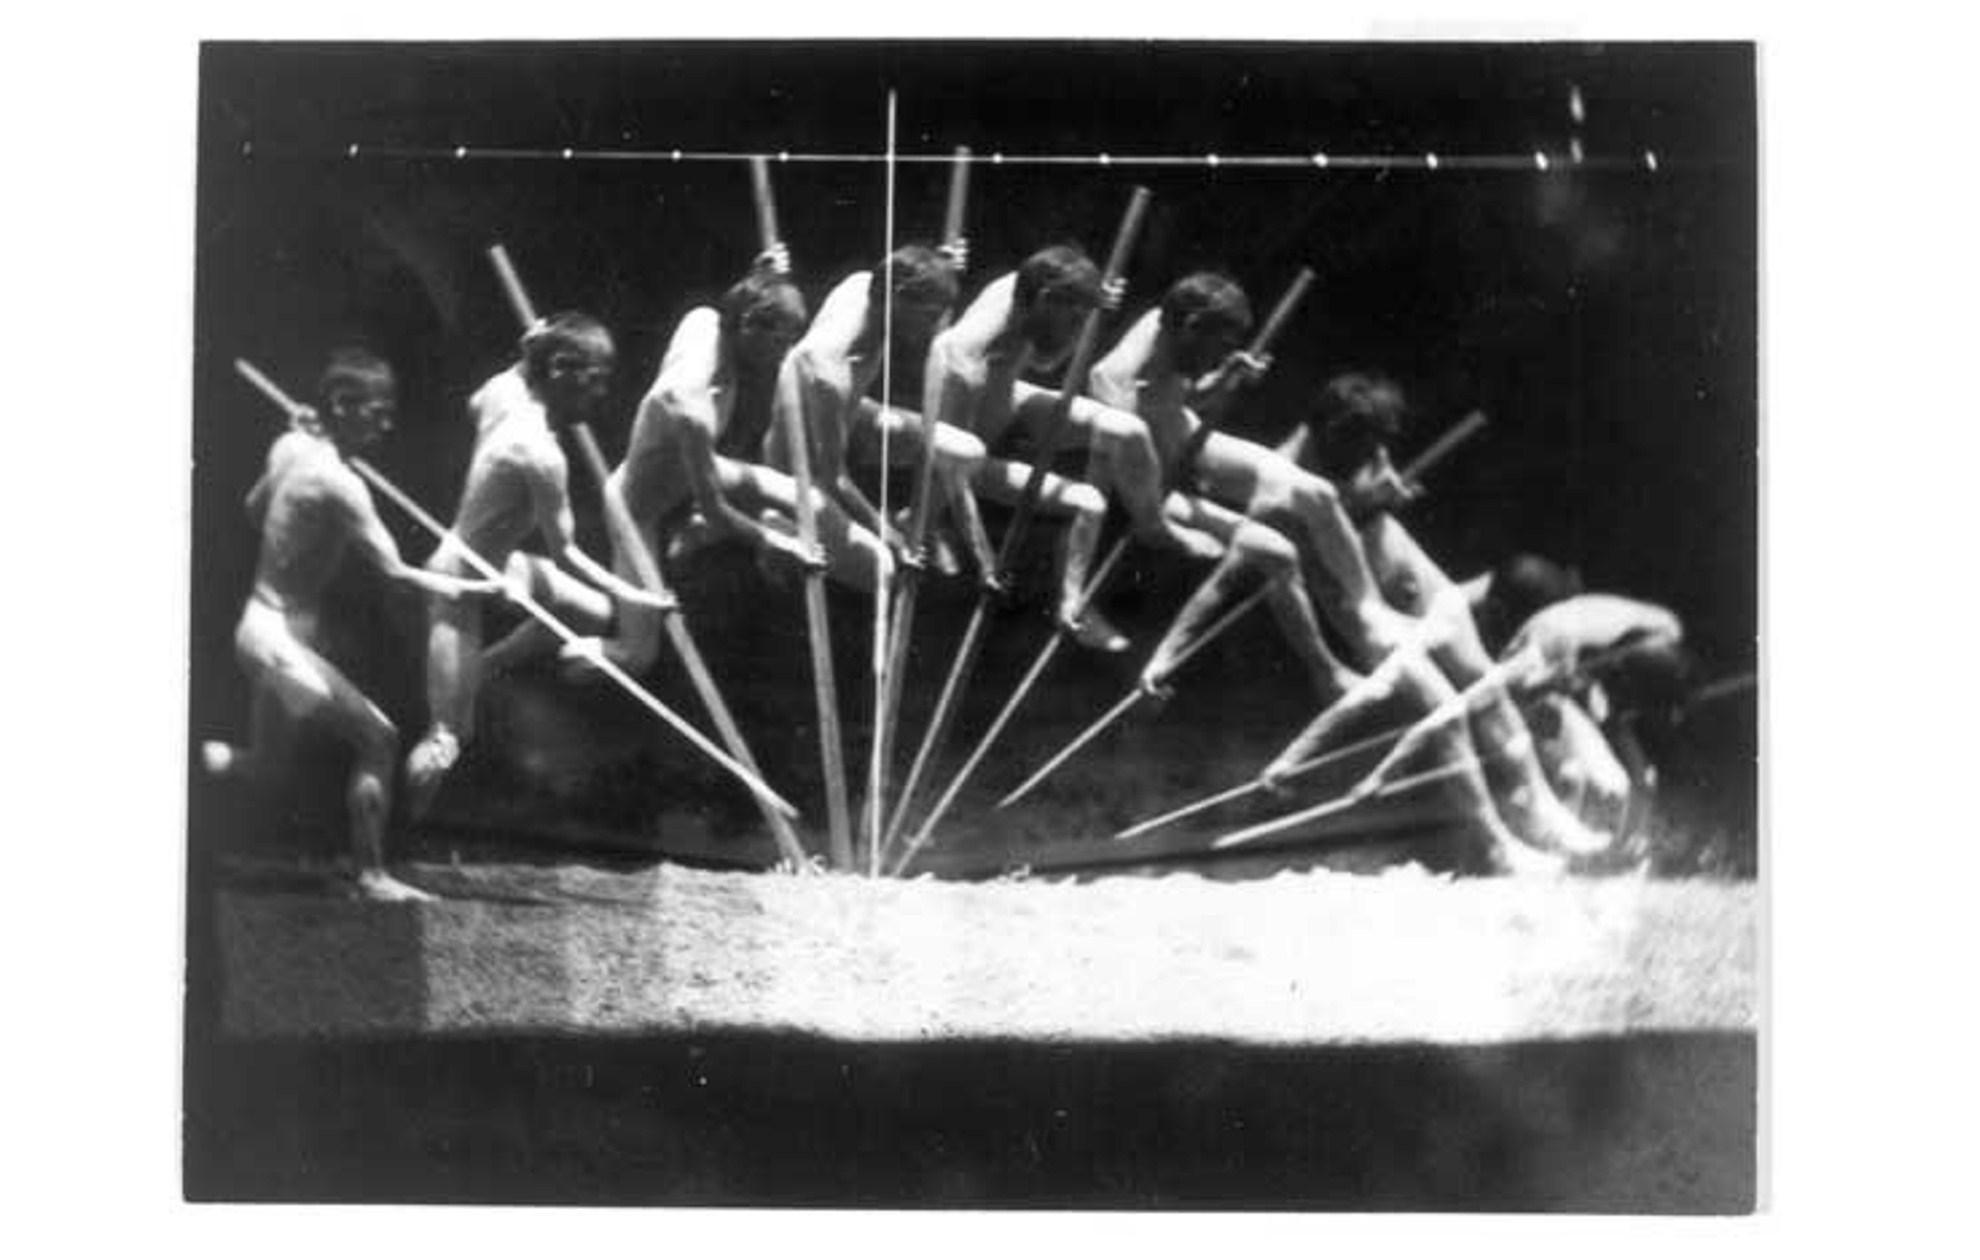 08. Eadweard Muybridge. Pole vaulter. 1887